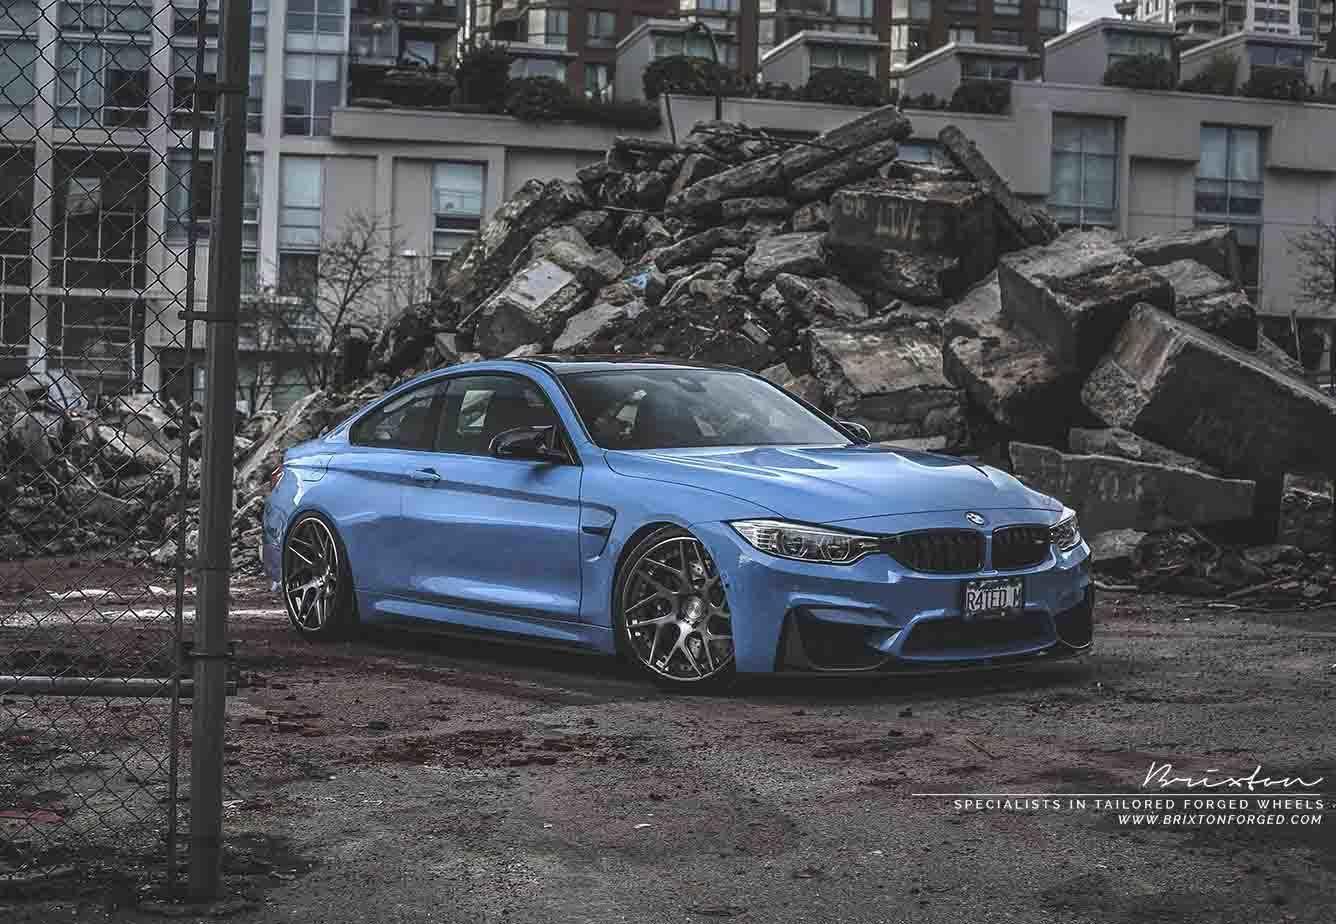 images-products-1-2538-232974826-bmw-f82-m4-brixton-forged-cm7-targa-series-20-smoke-black-yas-marina-blue-03.jpg